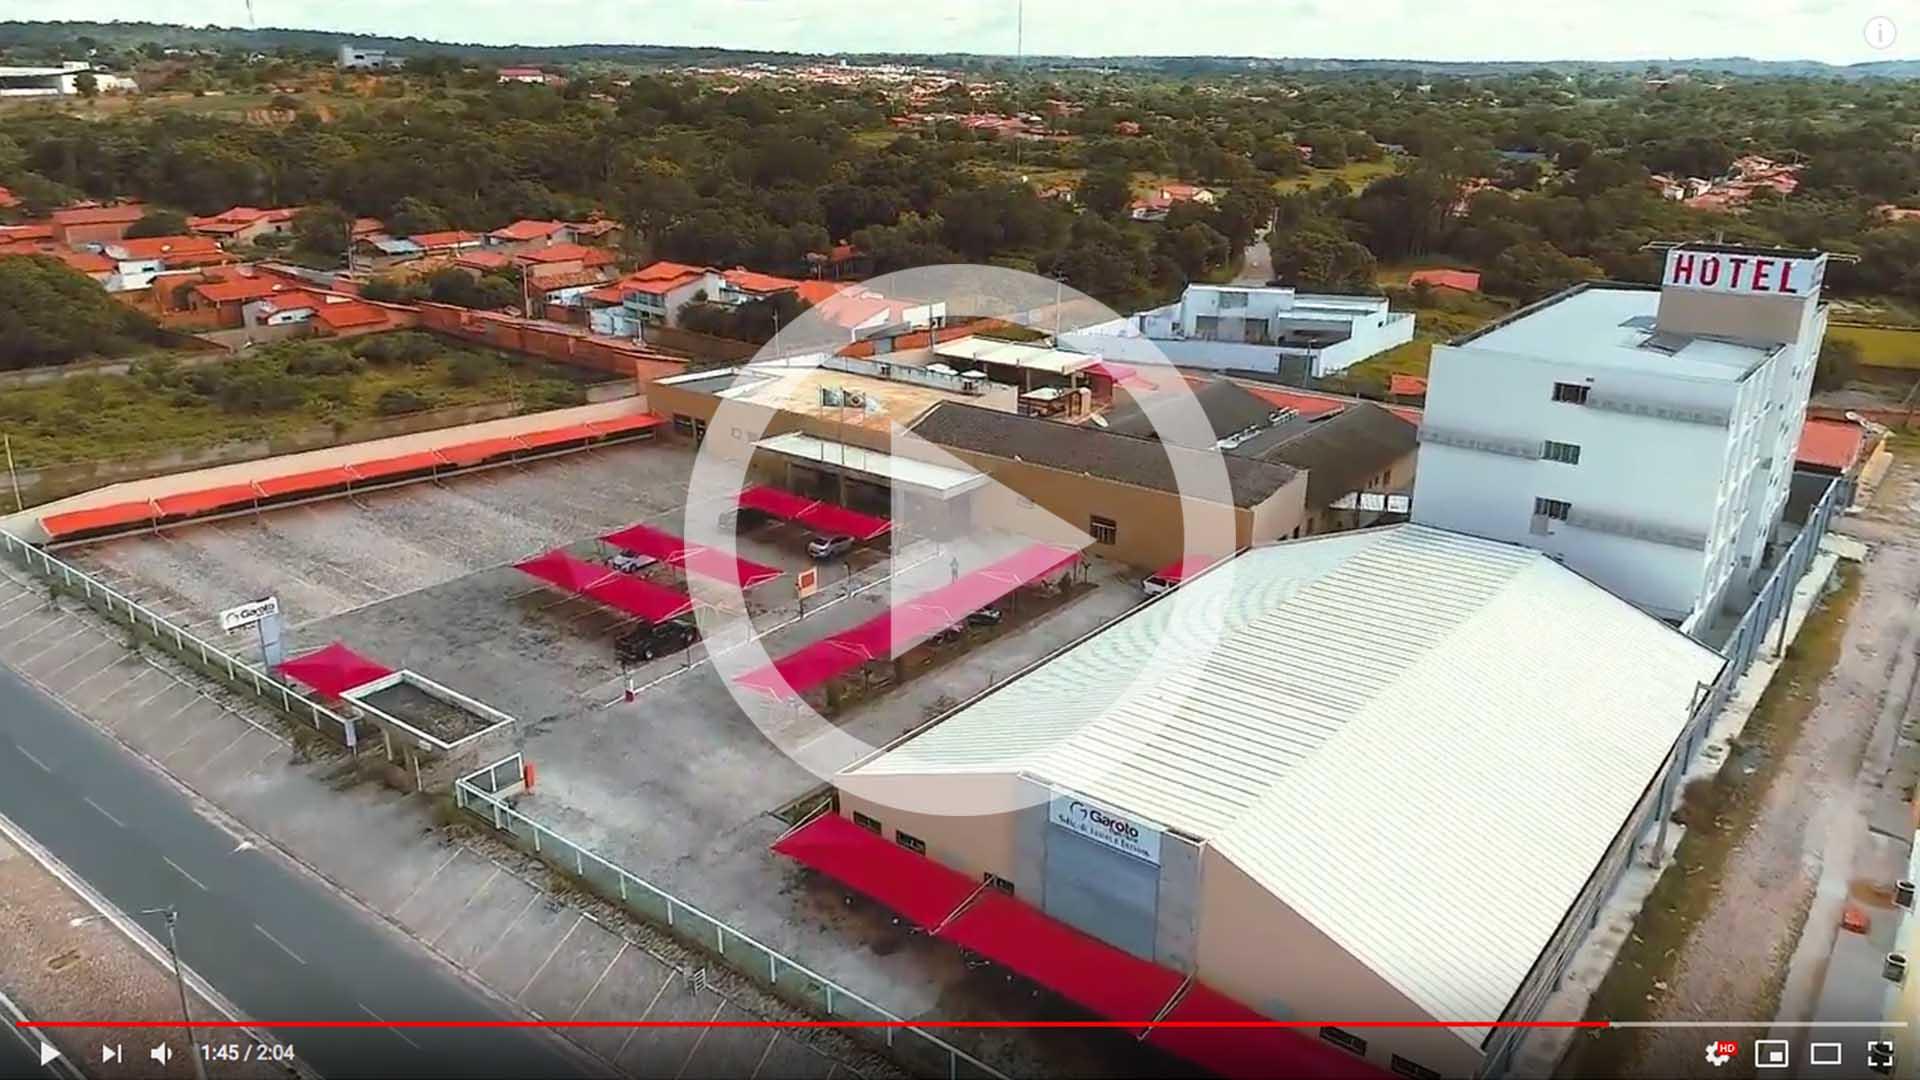 Hotel Garoto Park